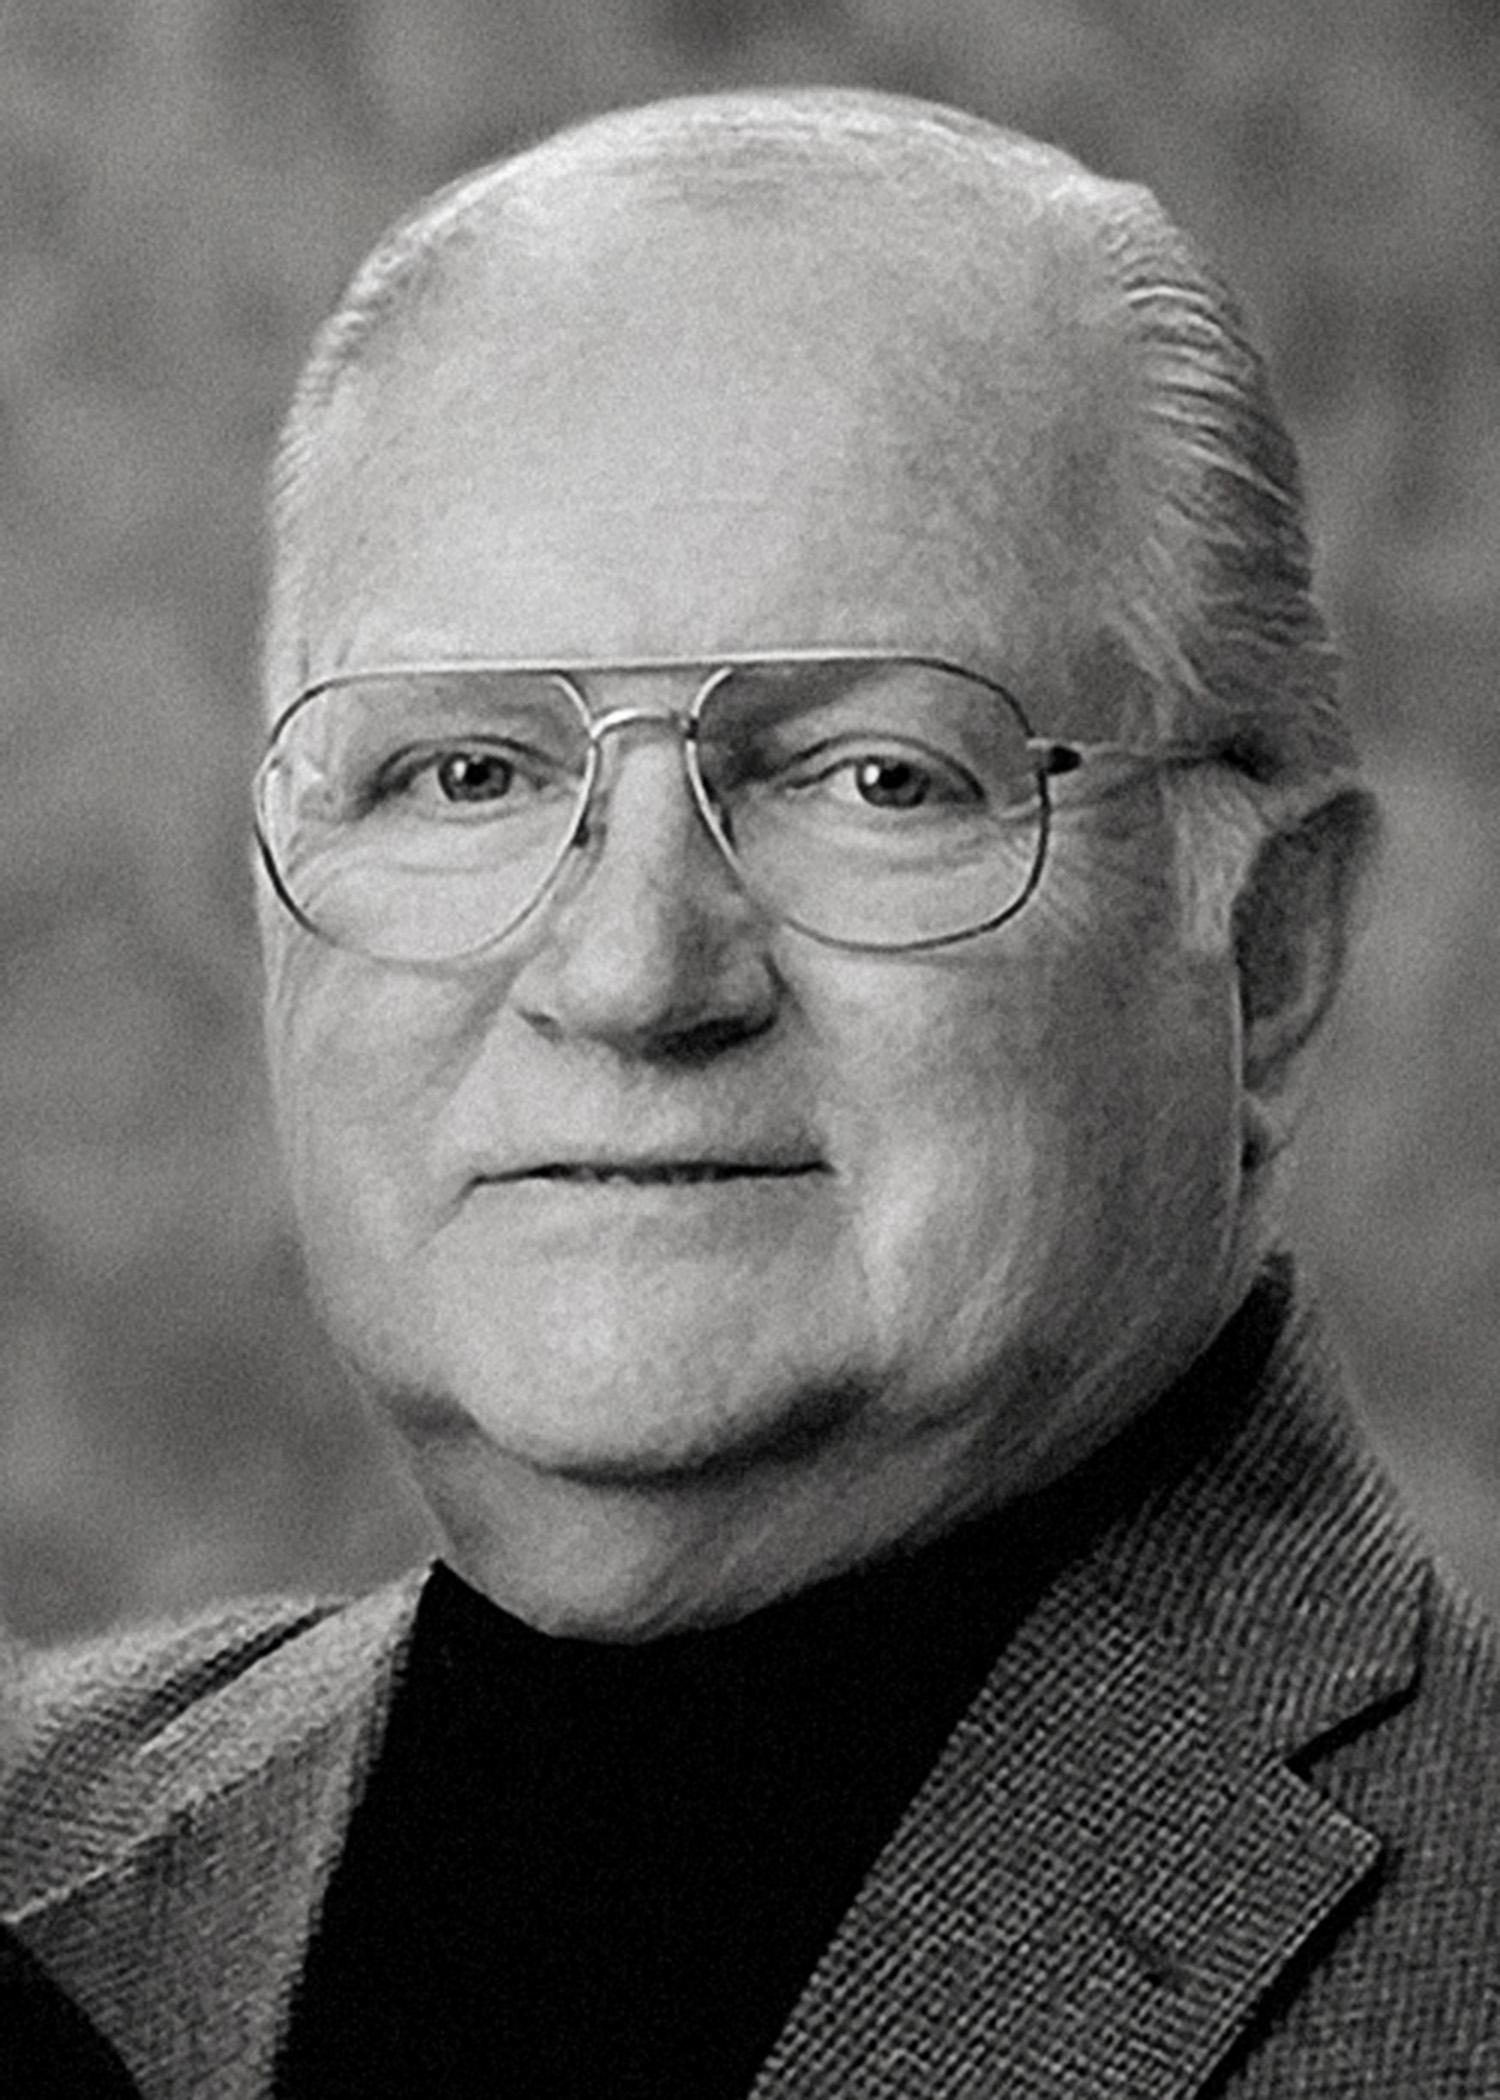 David Wacker portrait